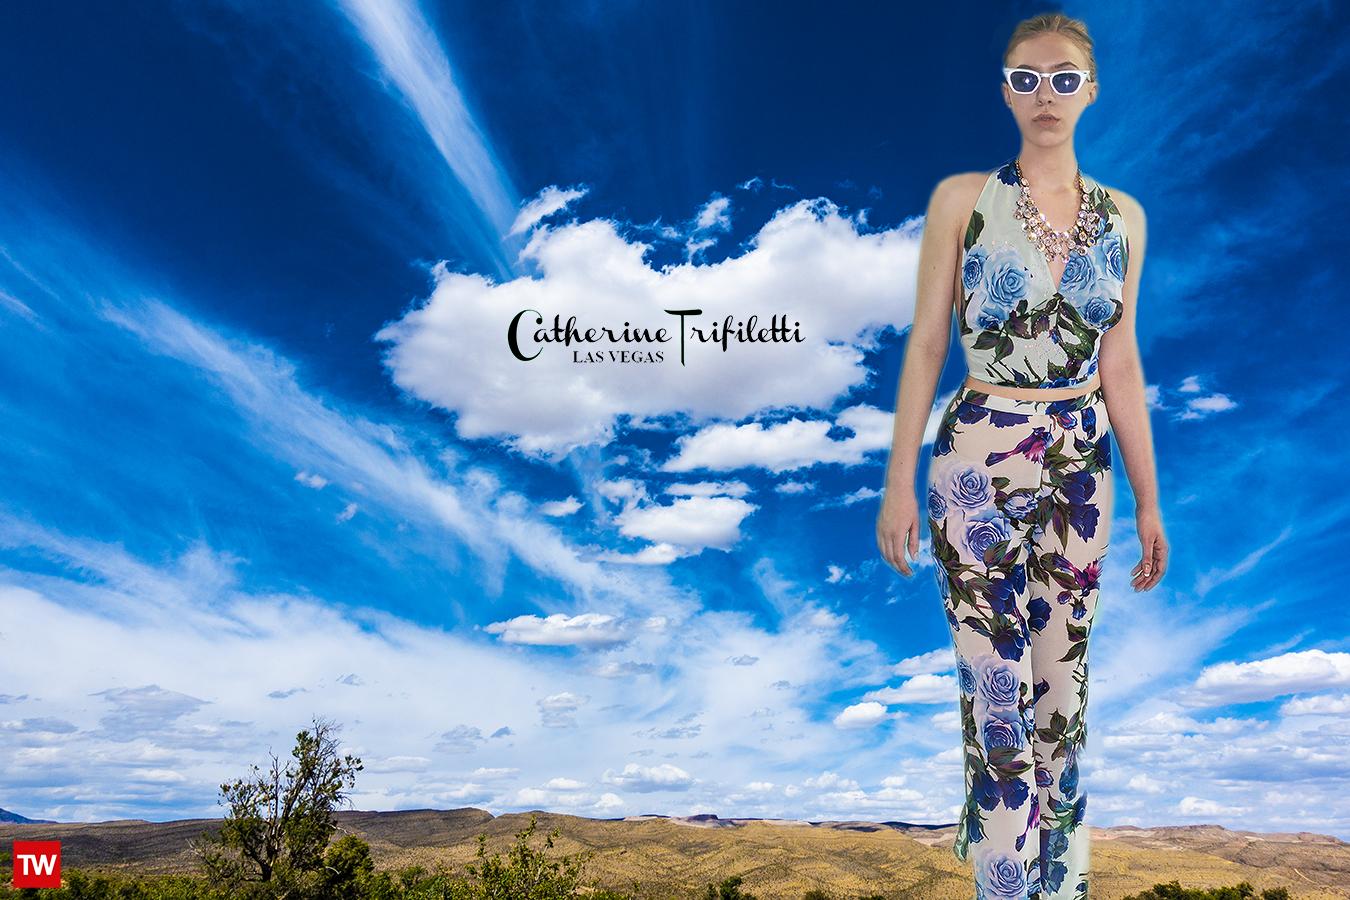 Tony_Ward_Studio_fashion_Shoot_Catherine_Trifiletti_summer_lookbook_2018_Las_Vegas